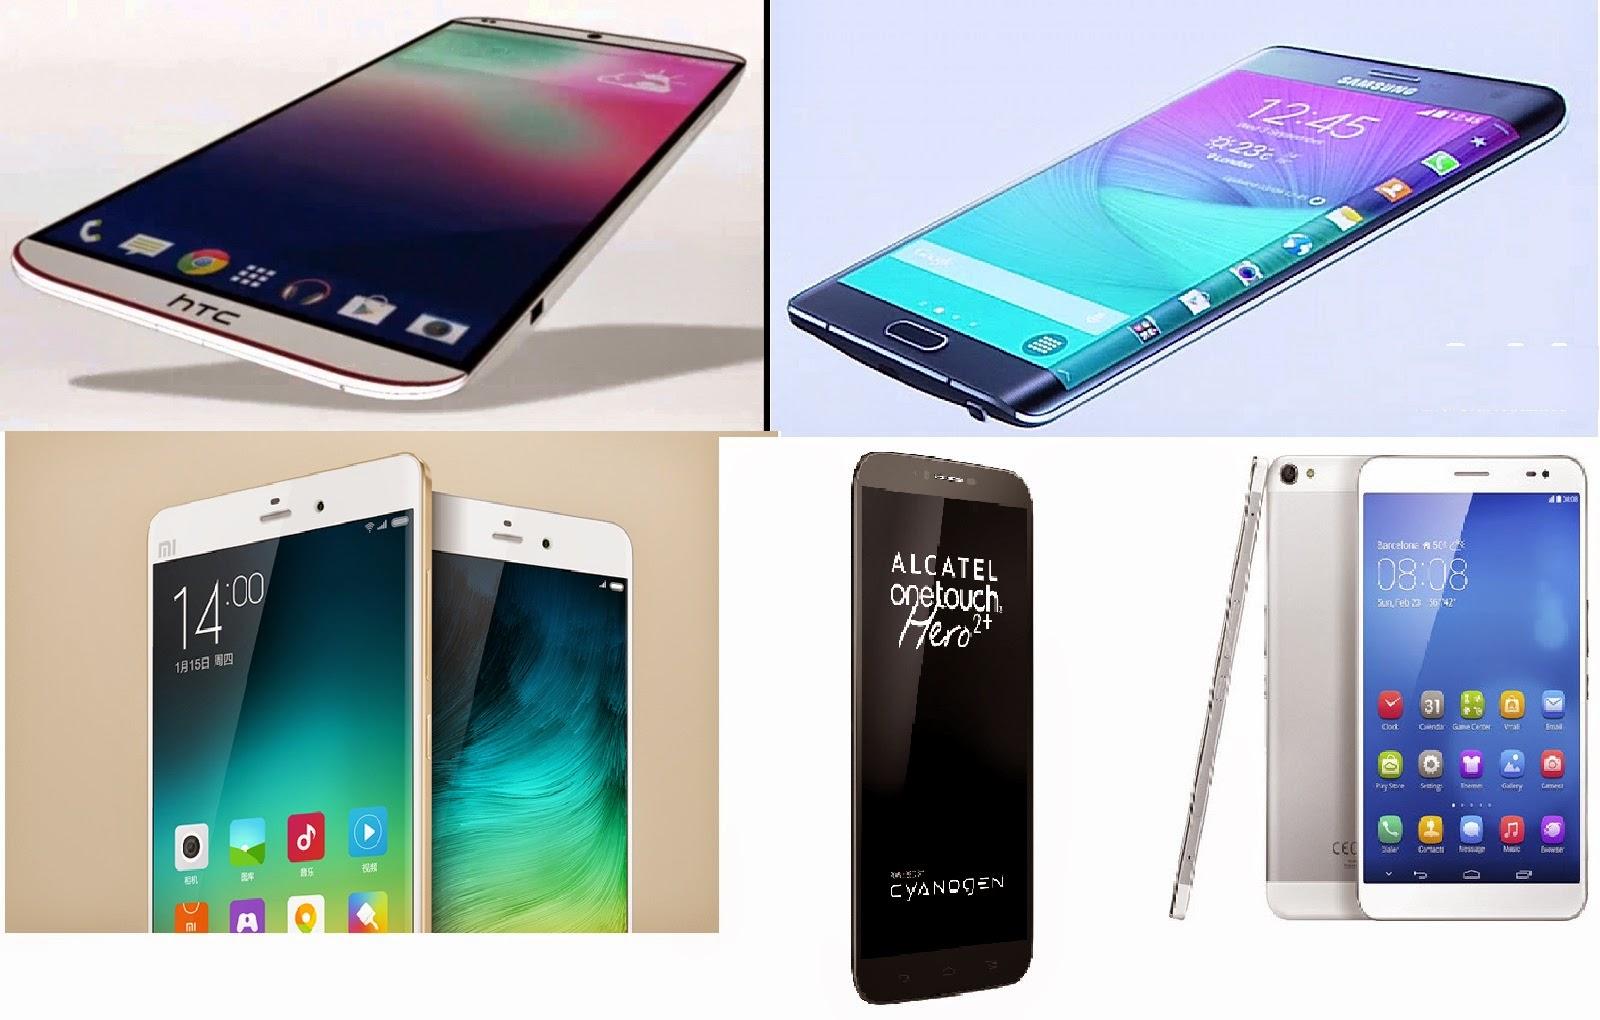 Smartphone Launched in March 2015 Alcatel OneTouch Hero 2+, Microsoft Lumia 640, Microsoft Lumia 640 XL, Lenovo Vibe Shot, Lenovo A7000, Sony Xperia M4 Aqua, Gionee Elife S7, Archos 62 Xenon, ZTE Grand S3, Huawei MediaPad X2, Acer Liquid Jade Z, Acer Liquid Z520, Samsung Galaxy S6 Edge, Samsung Galaxy S6, HTC One M9,